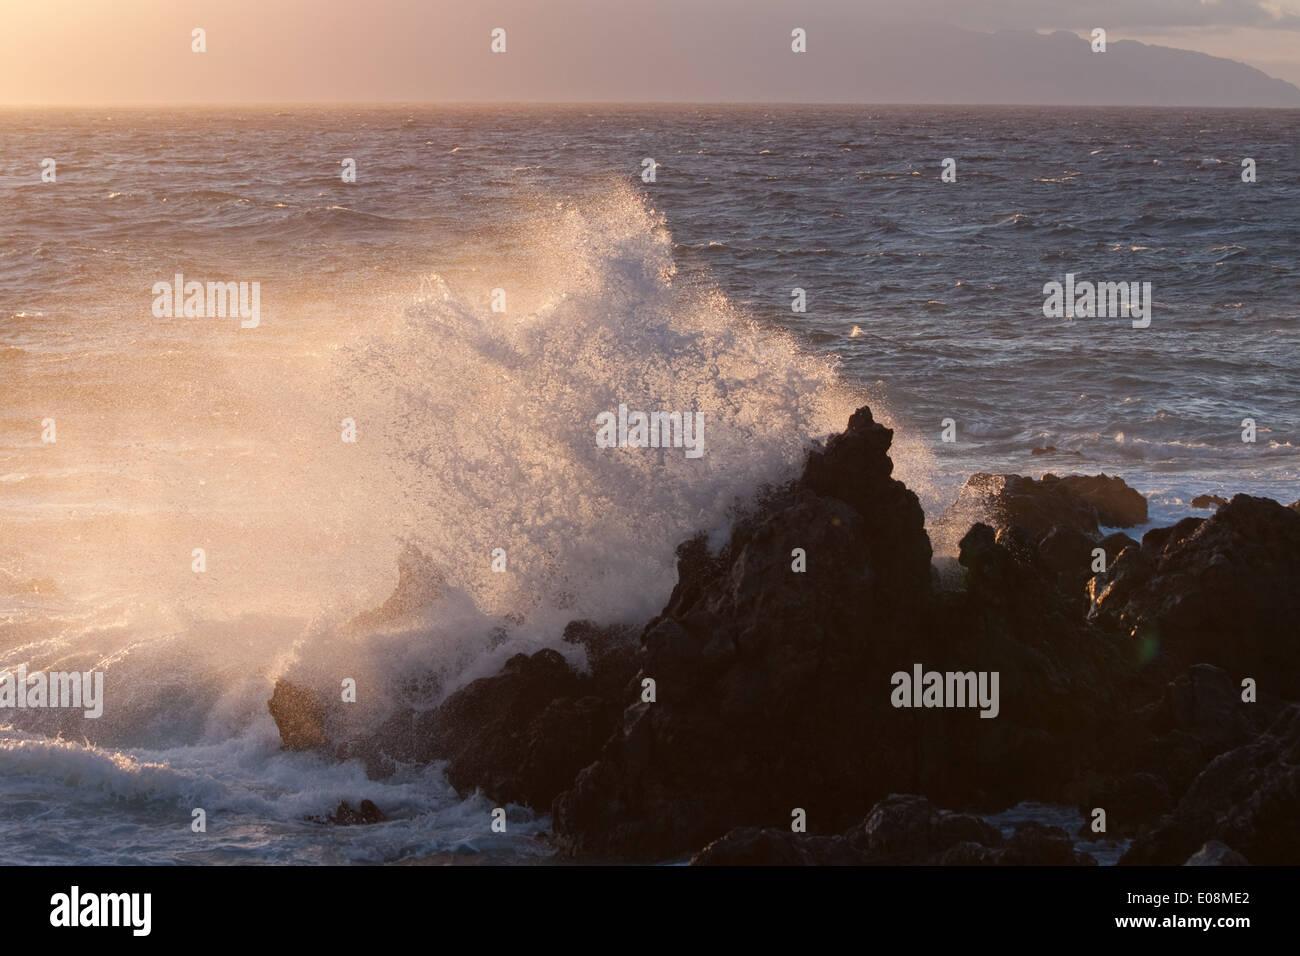 Meeresbrandung, Playa de San Juan, Teneriffa, Spanien - Breaking seawater, Playa de San Juan, Tenerife, Spain - Stock Image